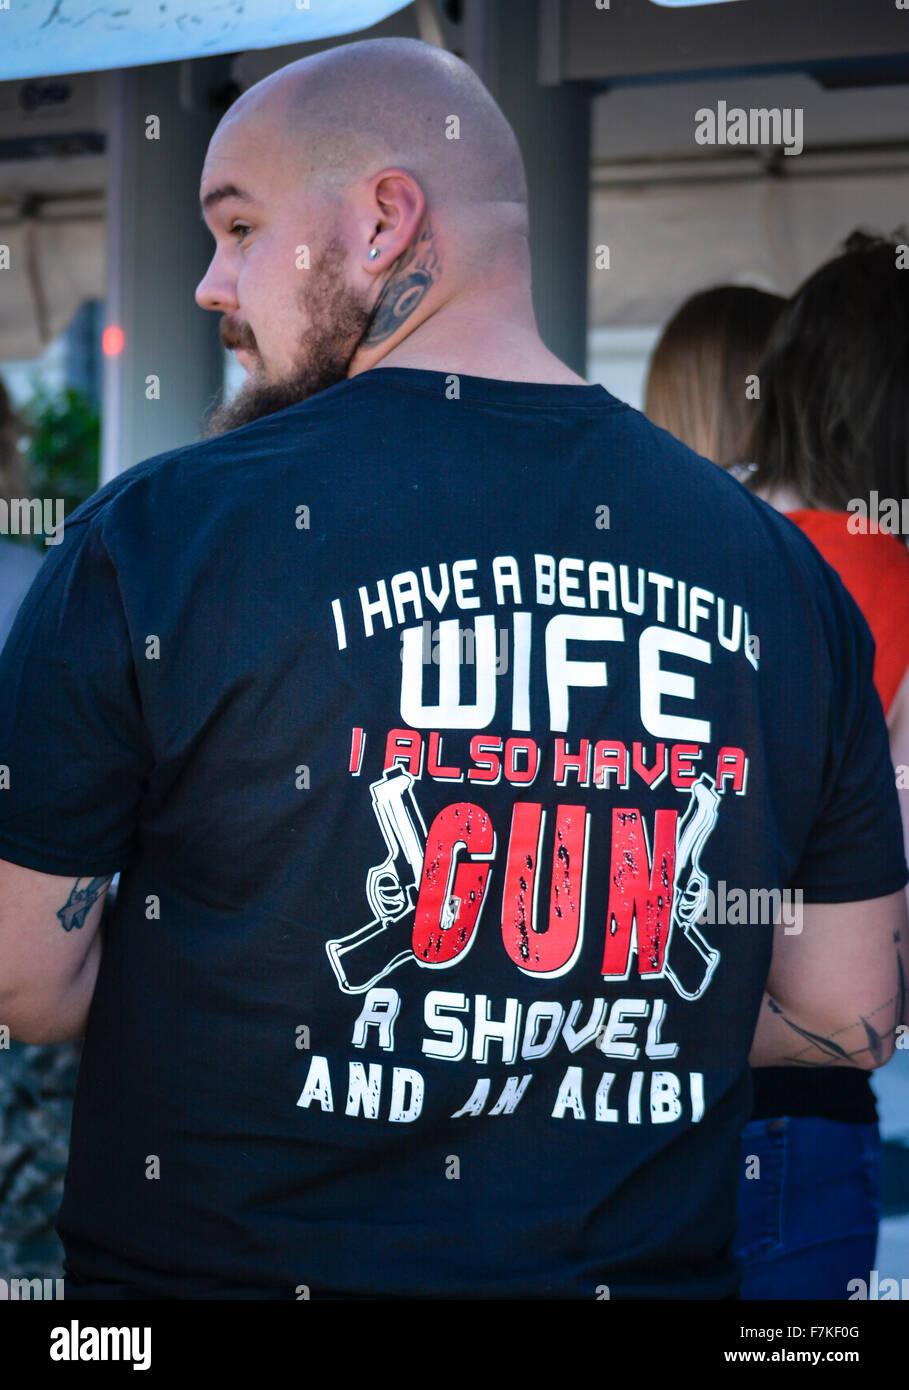 Tattooed Man wearing offensive tee shirt threatening anyone